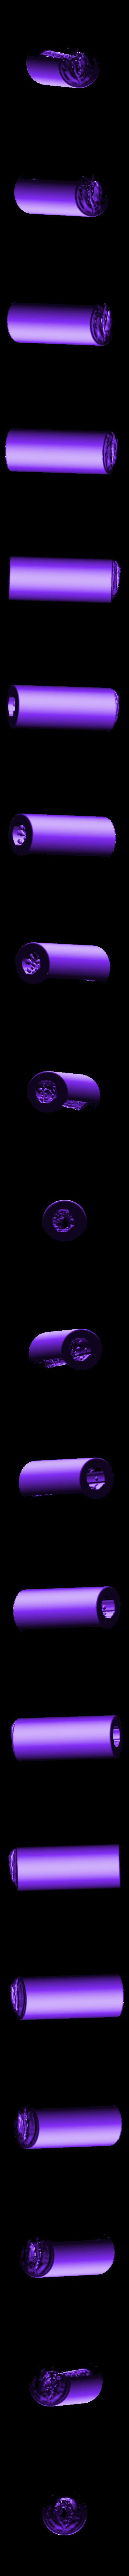 fleshl.stl Download STL file male masturbator vagina with texture • 3D printer design, Darkas2